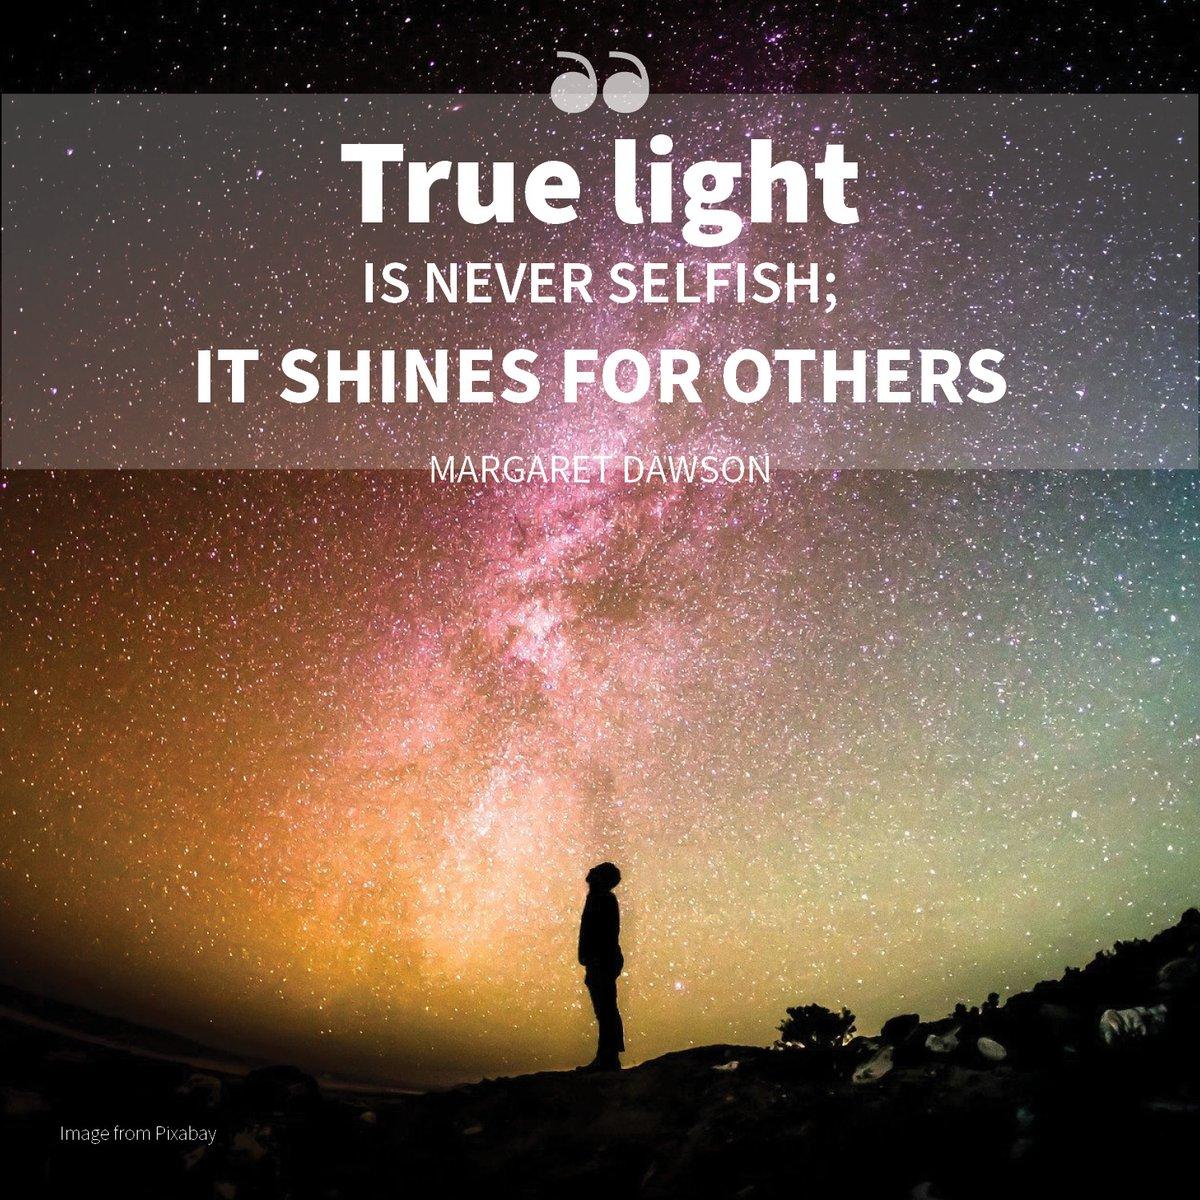 """True Light Is never selfish."" Shining your true light helps others shine their light. #letyourtruelightshine #shineyourlight #beyourself #beyou #doyou #foryou #selfempowerment #selflove #light #womeninSTEM #femalepublicspeakers #publicspeakers #publicspeaking #womenintech #STEMpic.twitter.com/3HF7sAfUZ2"